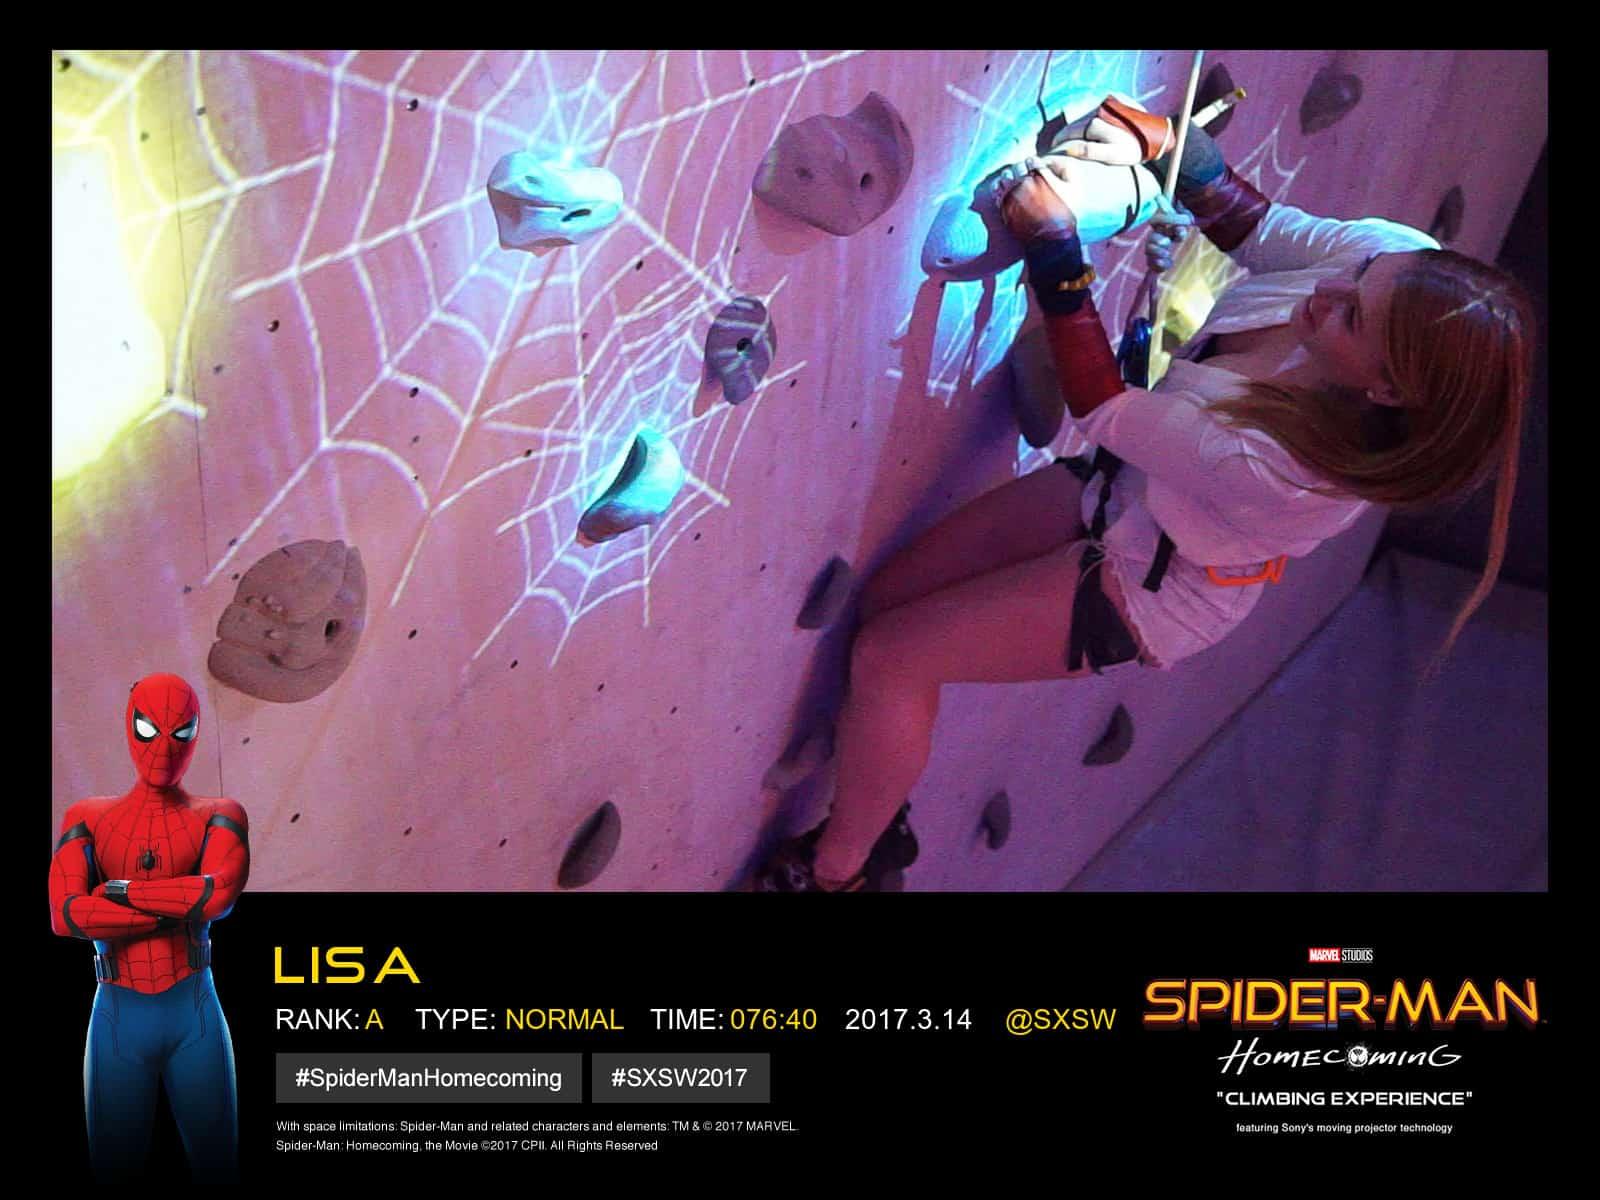 Lisa-Marie climbing Sony's Spiderman wall